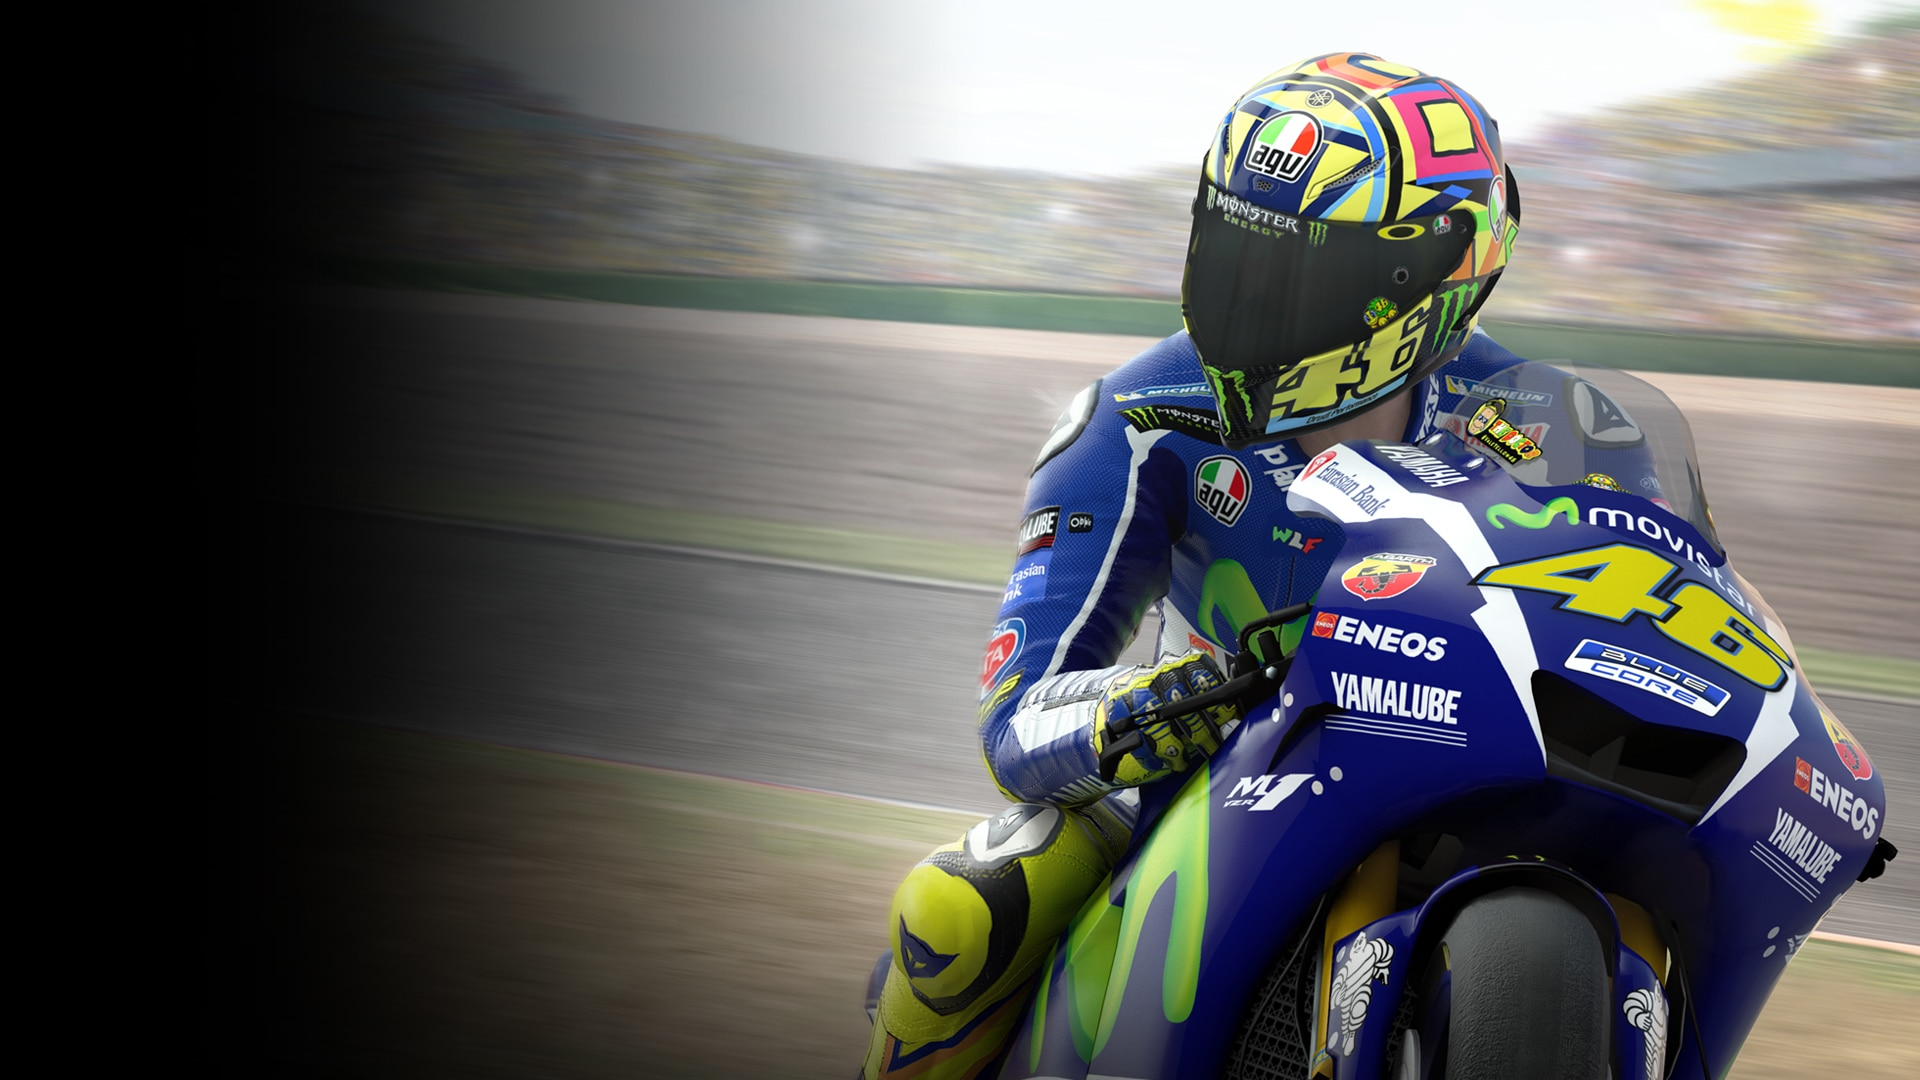 Real Events 1: 2016 MotoGP™ Season